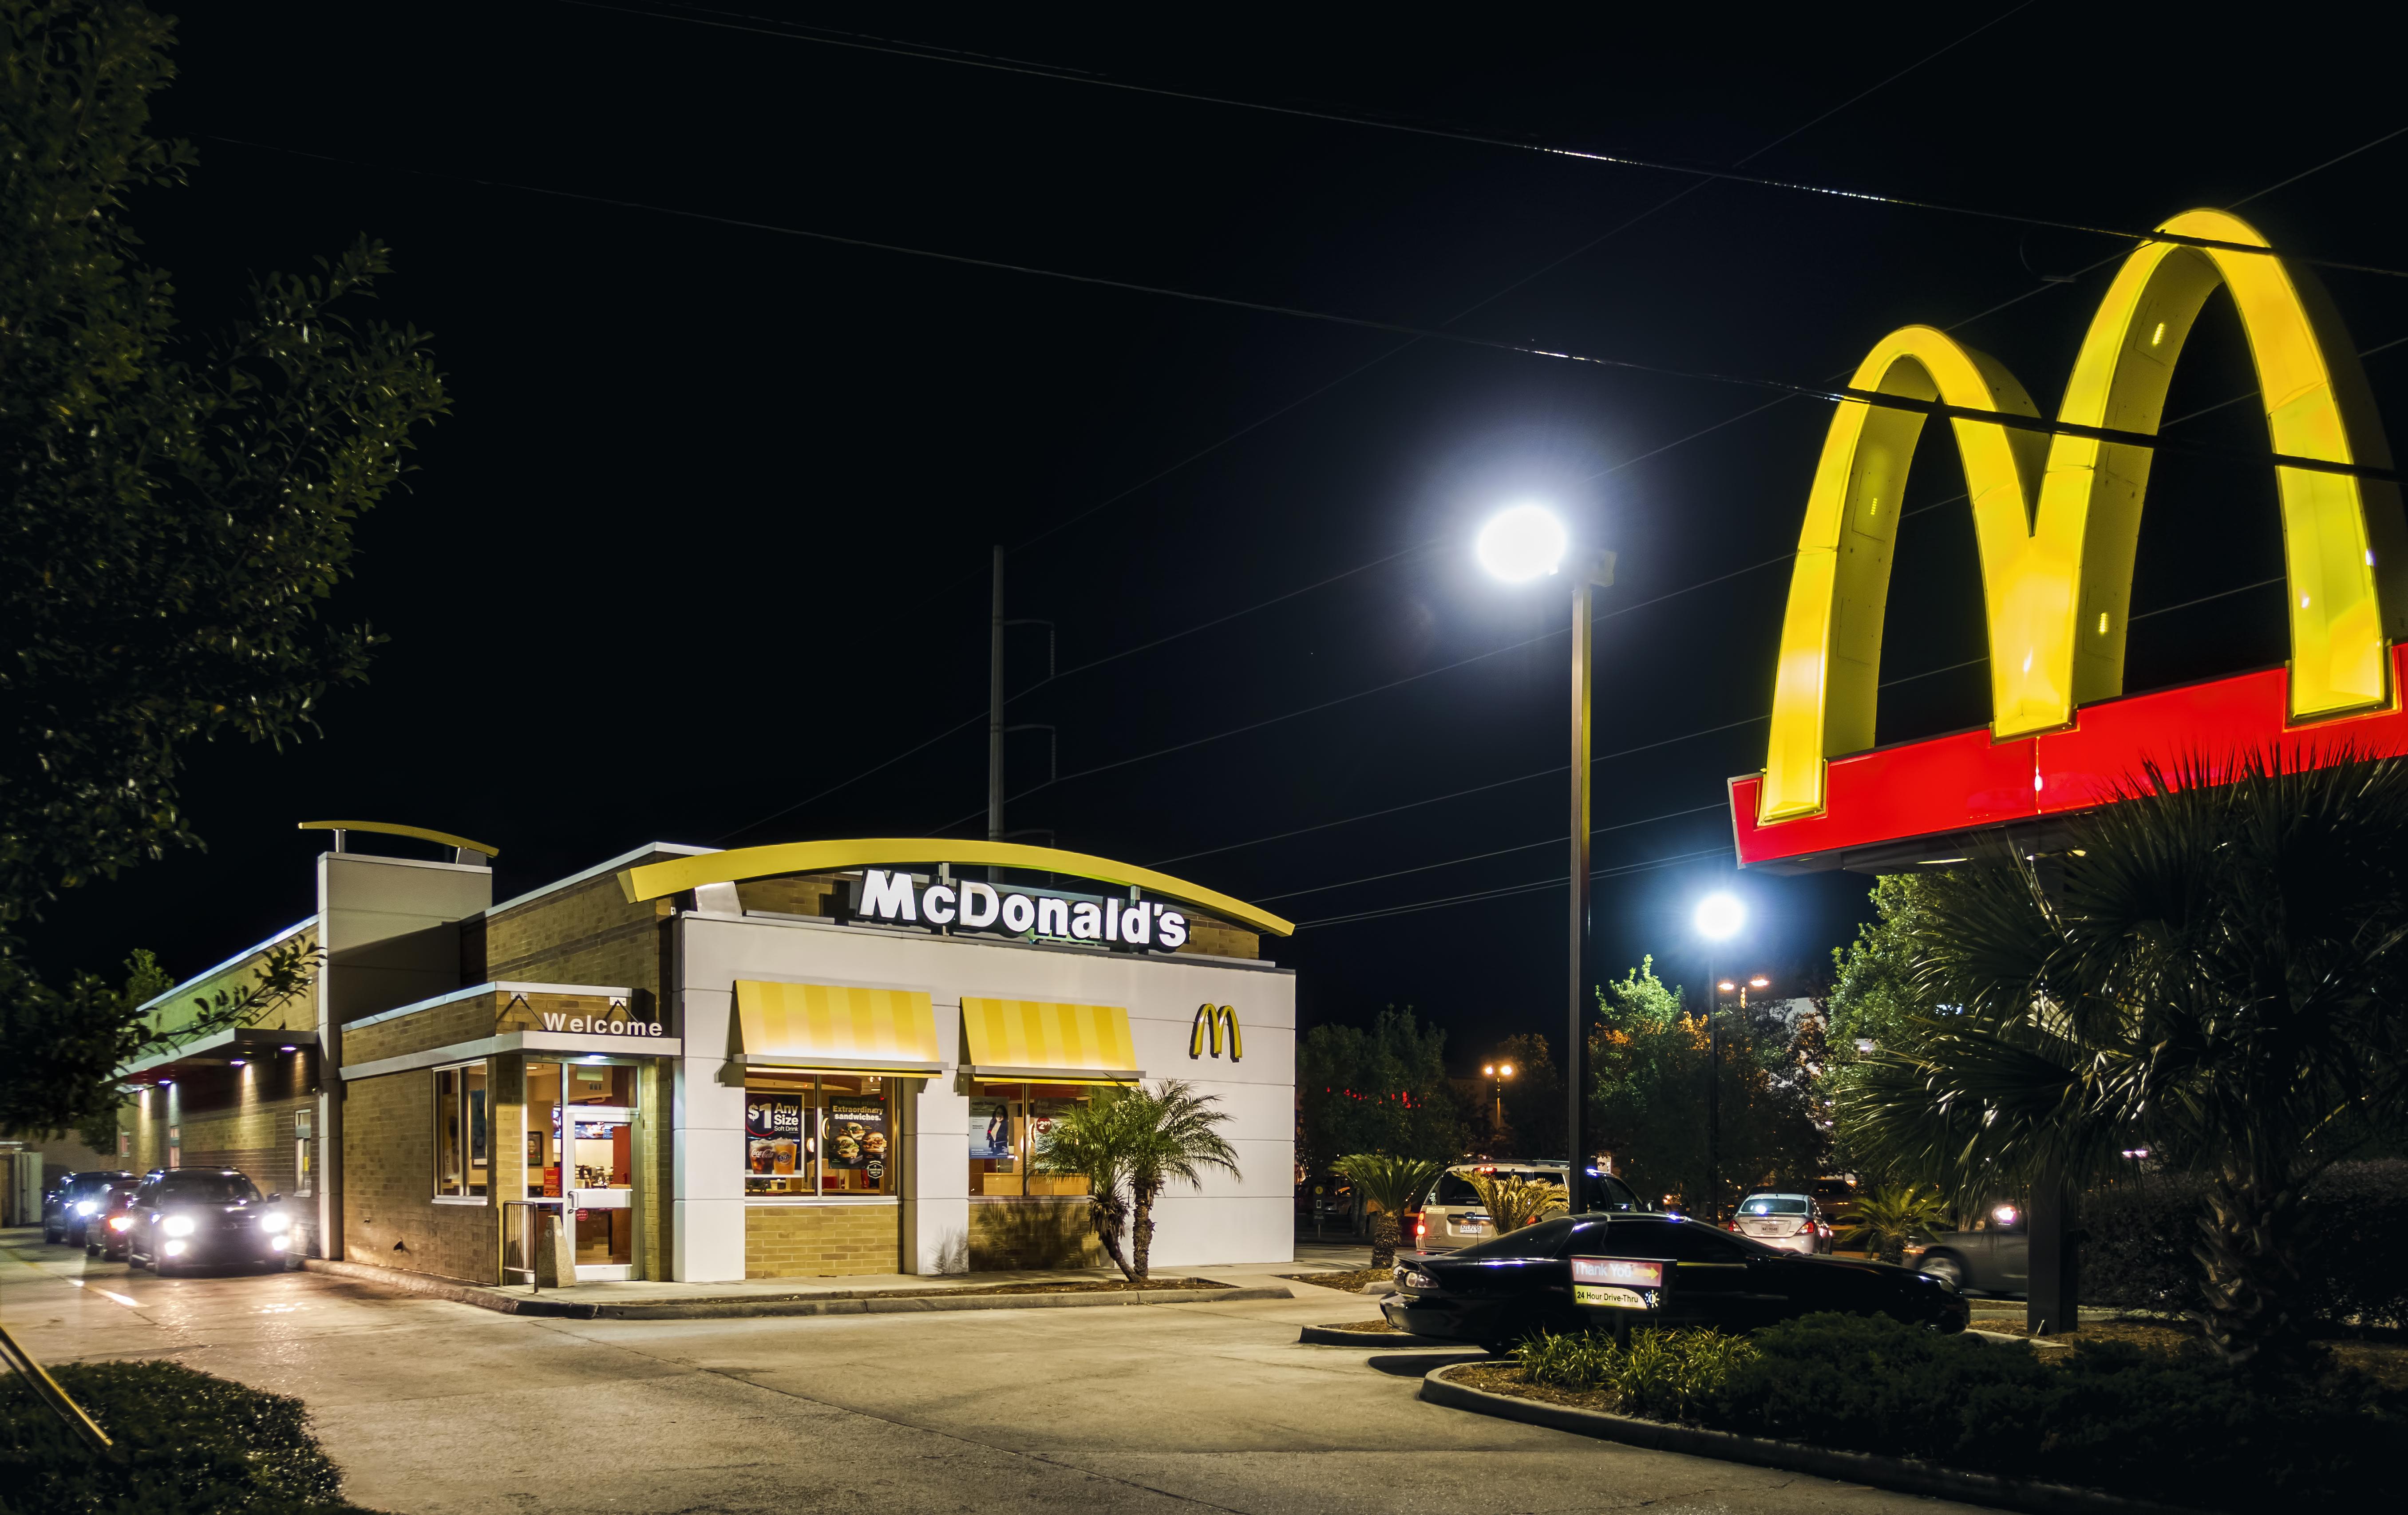 New Orleans, USA - Nov 29, 2017: McDonald's Family Restaurant drive-through and external car park. Night scene along Verterans Boulevard. McDonald's is now a global burger chain.